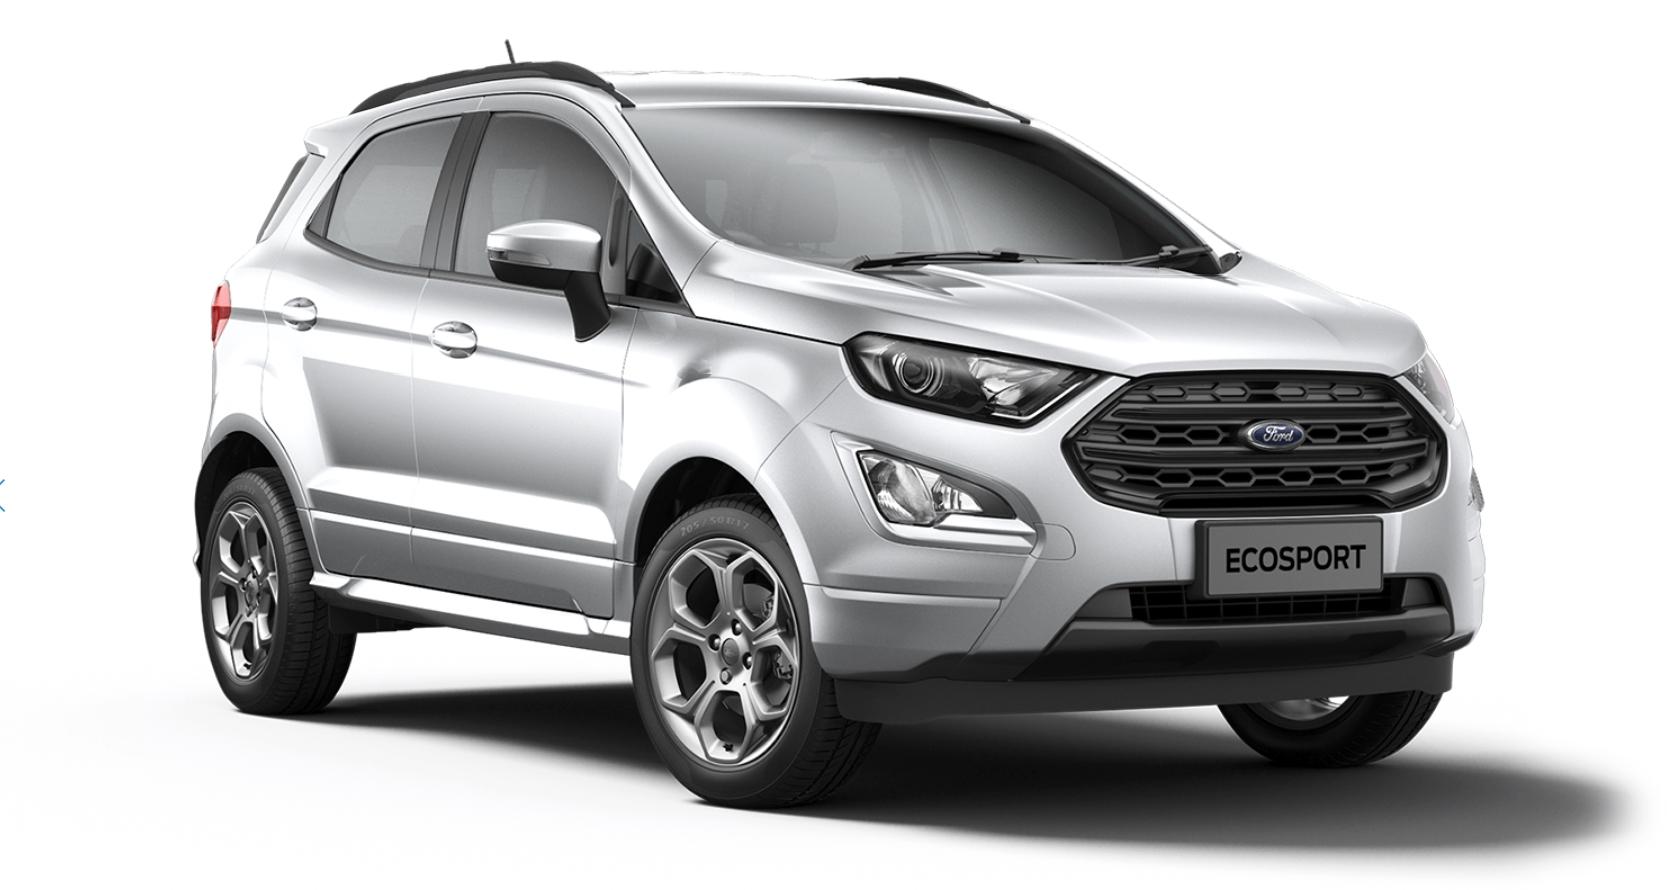 Ford EcoSport 1.0 EcoBoost 125ps ST Line 5dr